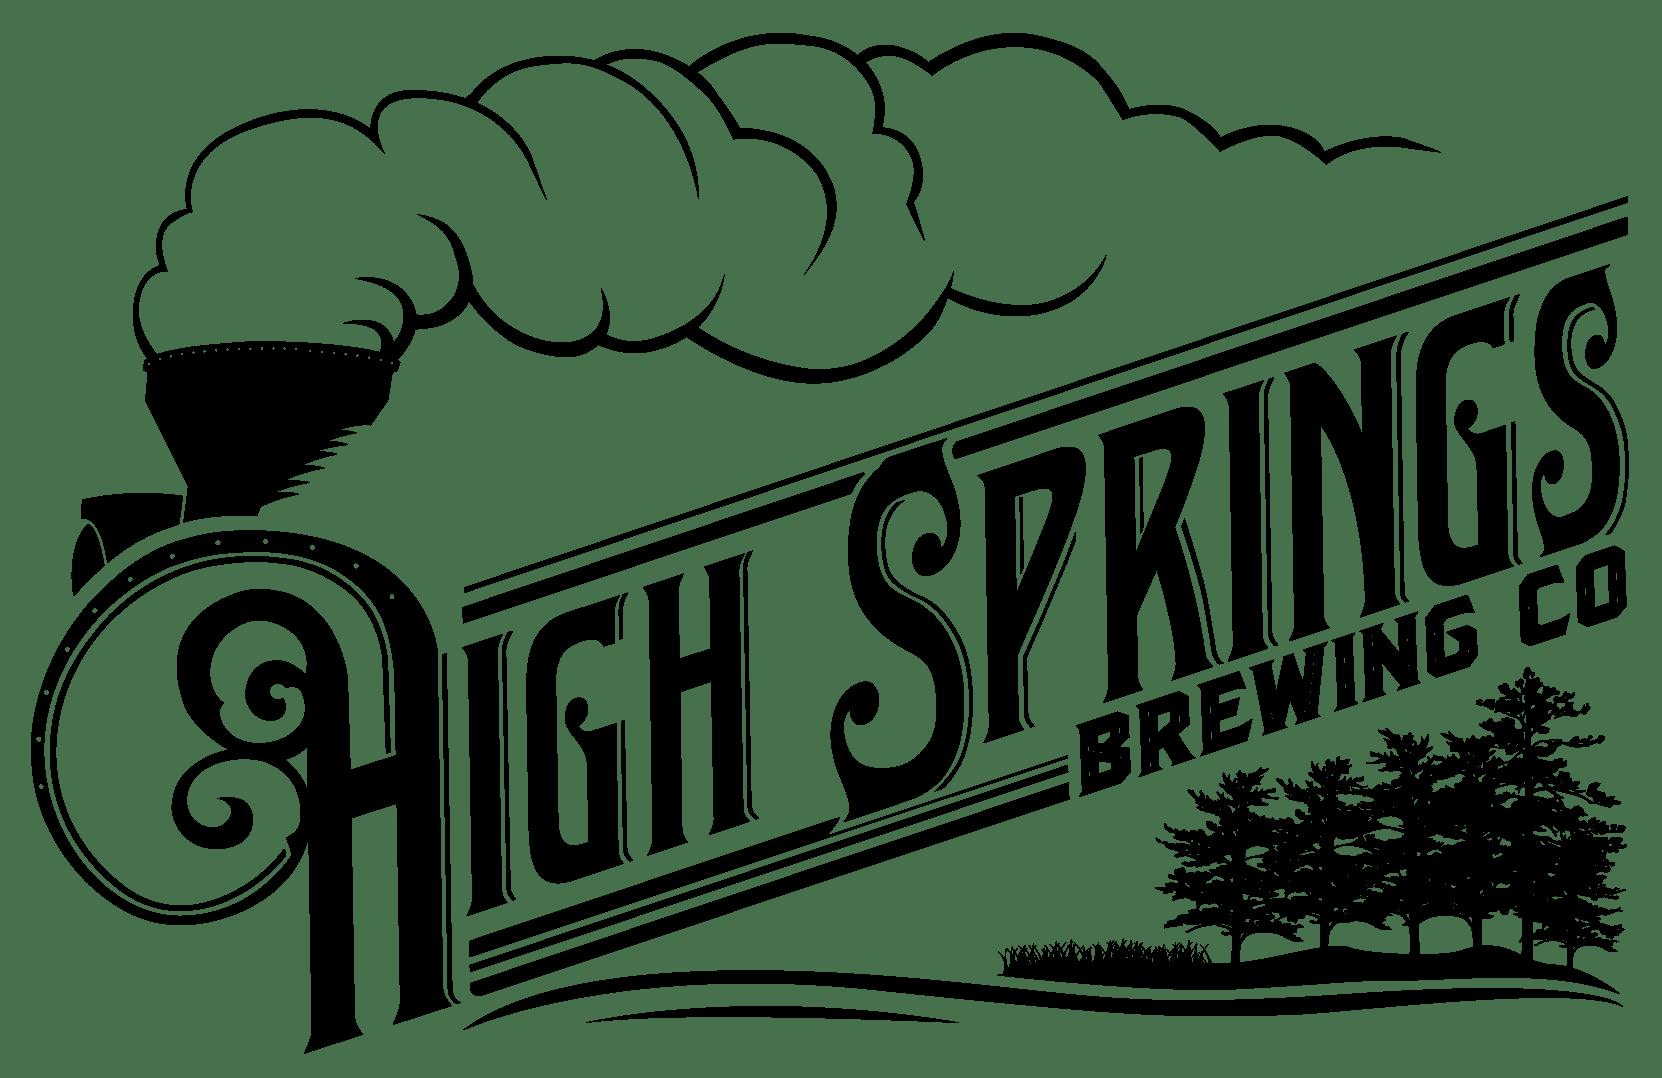 High Springs Brewing